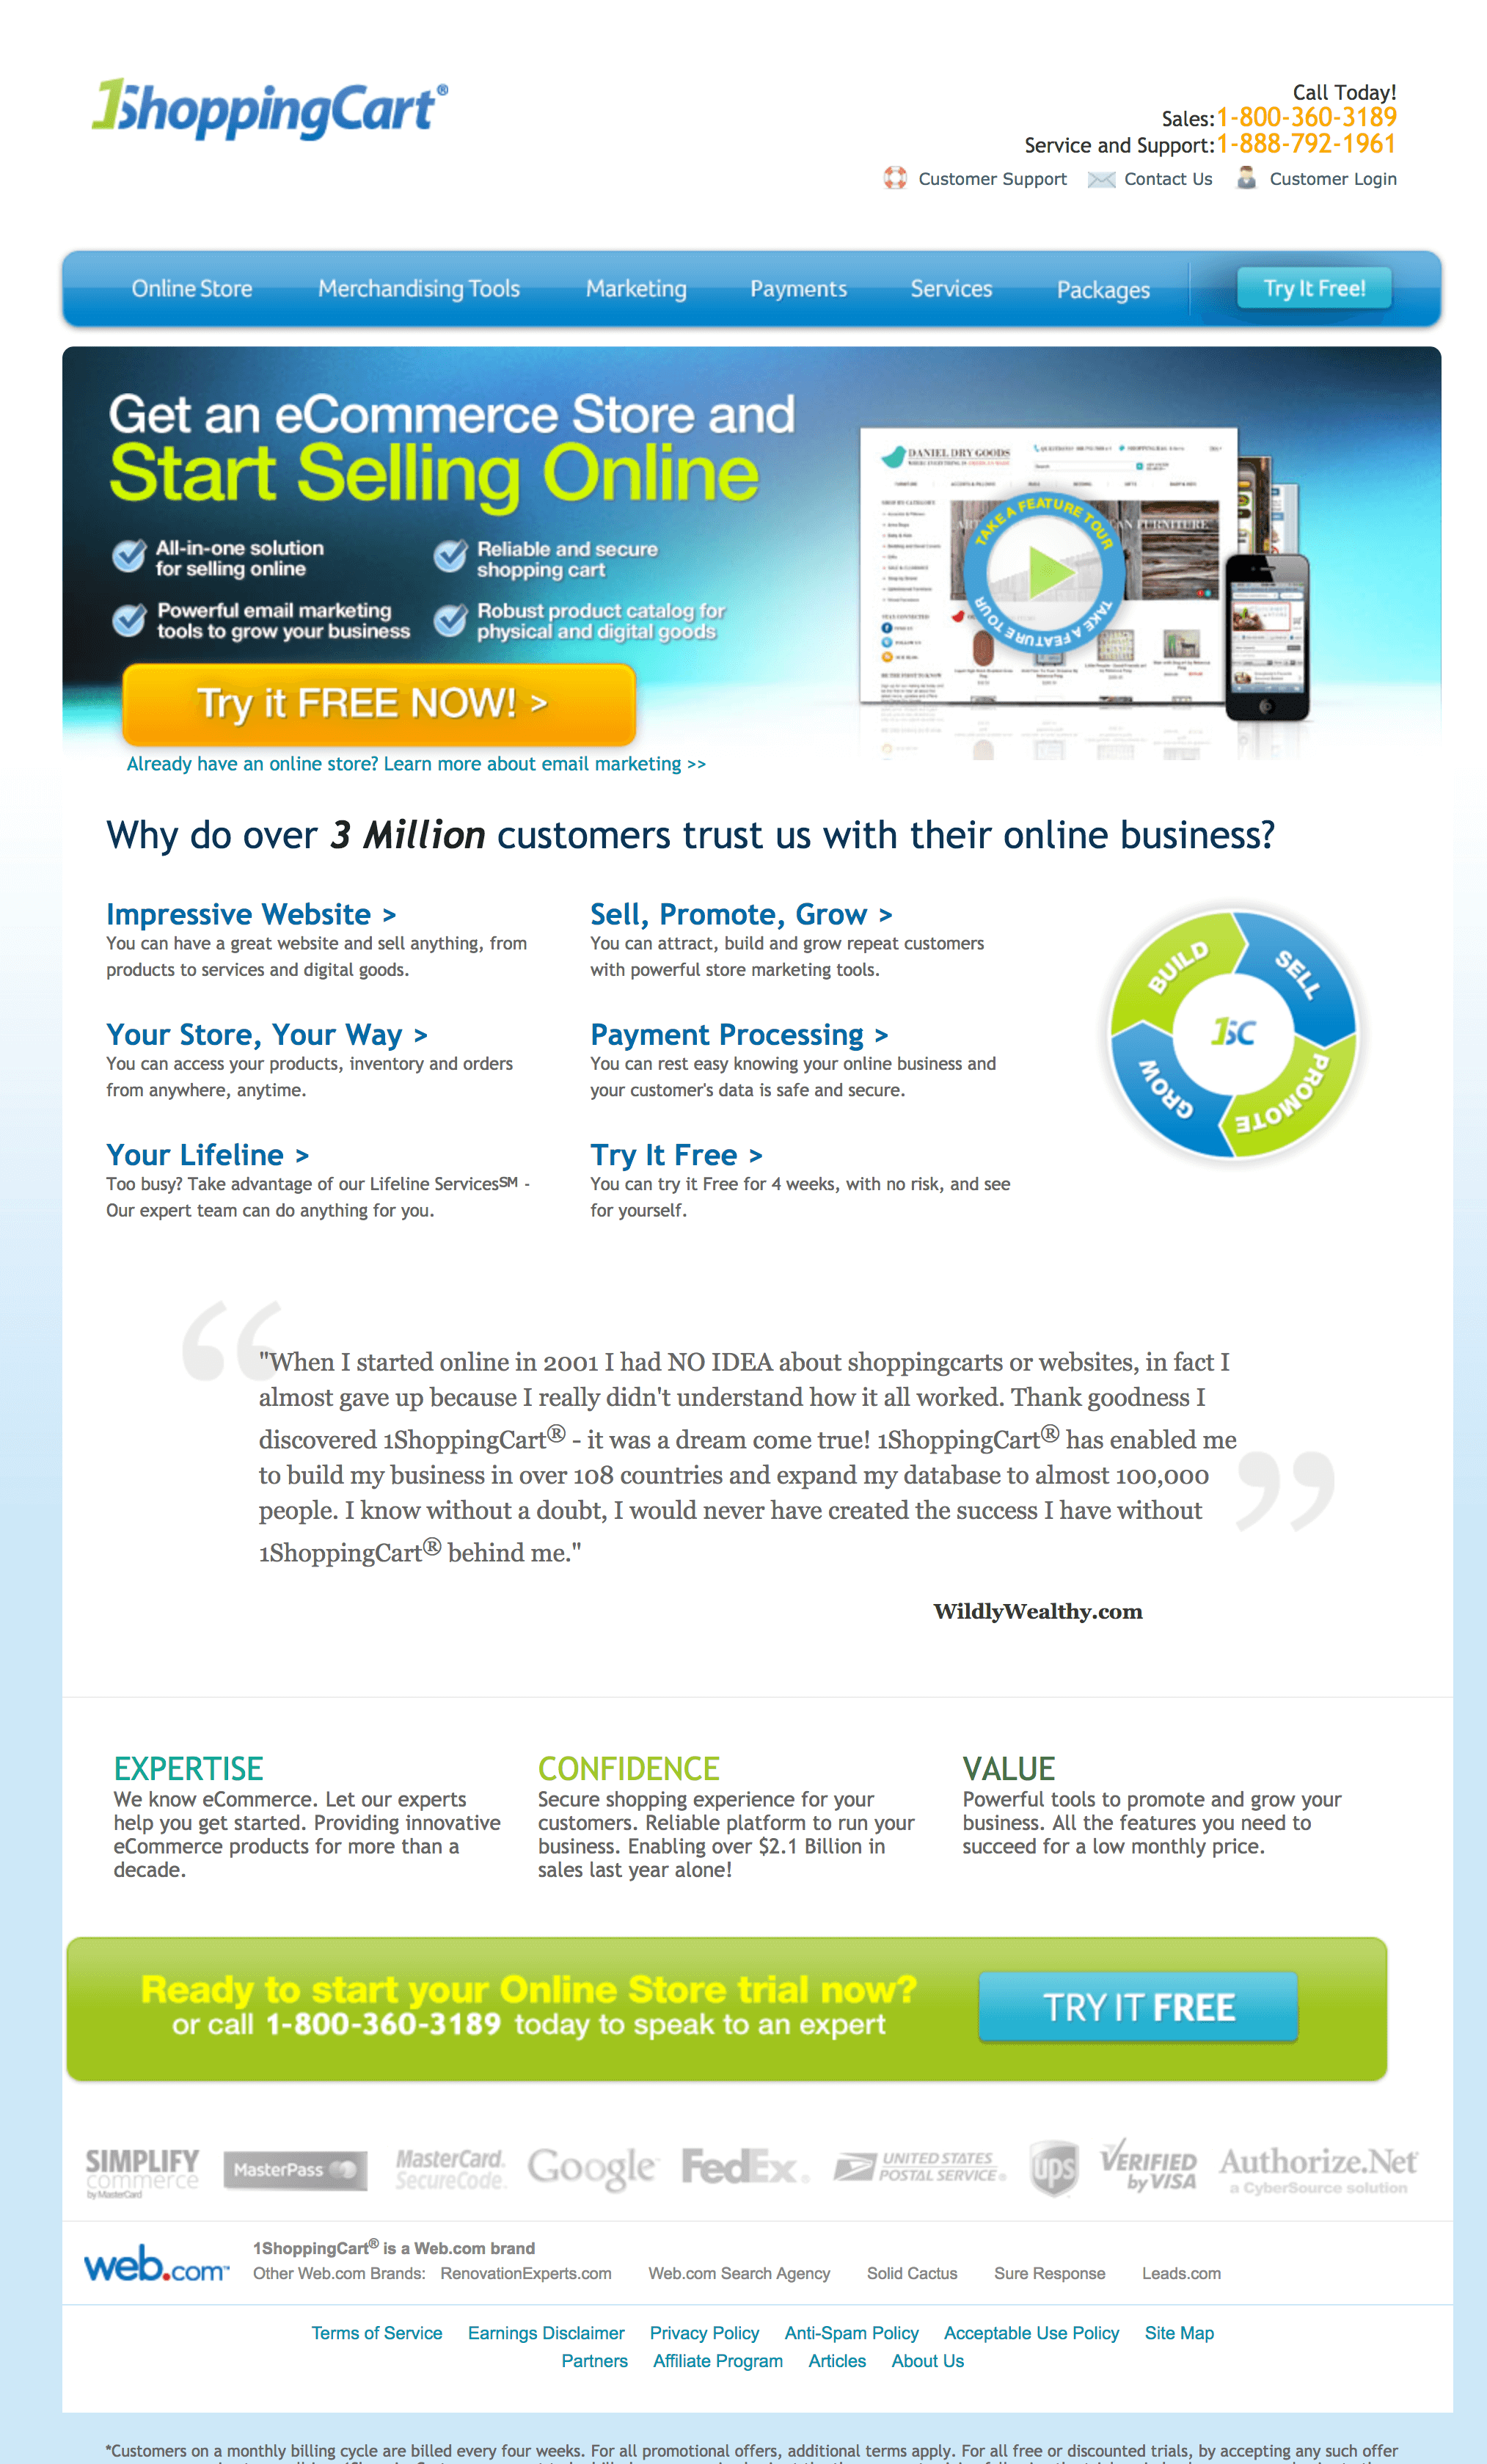 1shoppingcart homepage